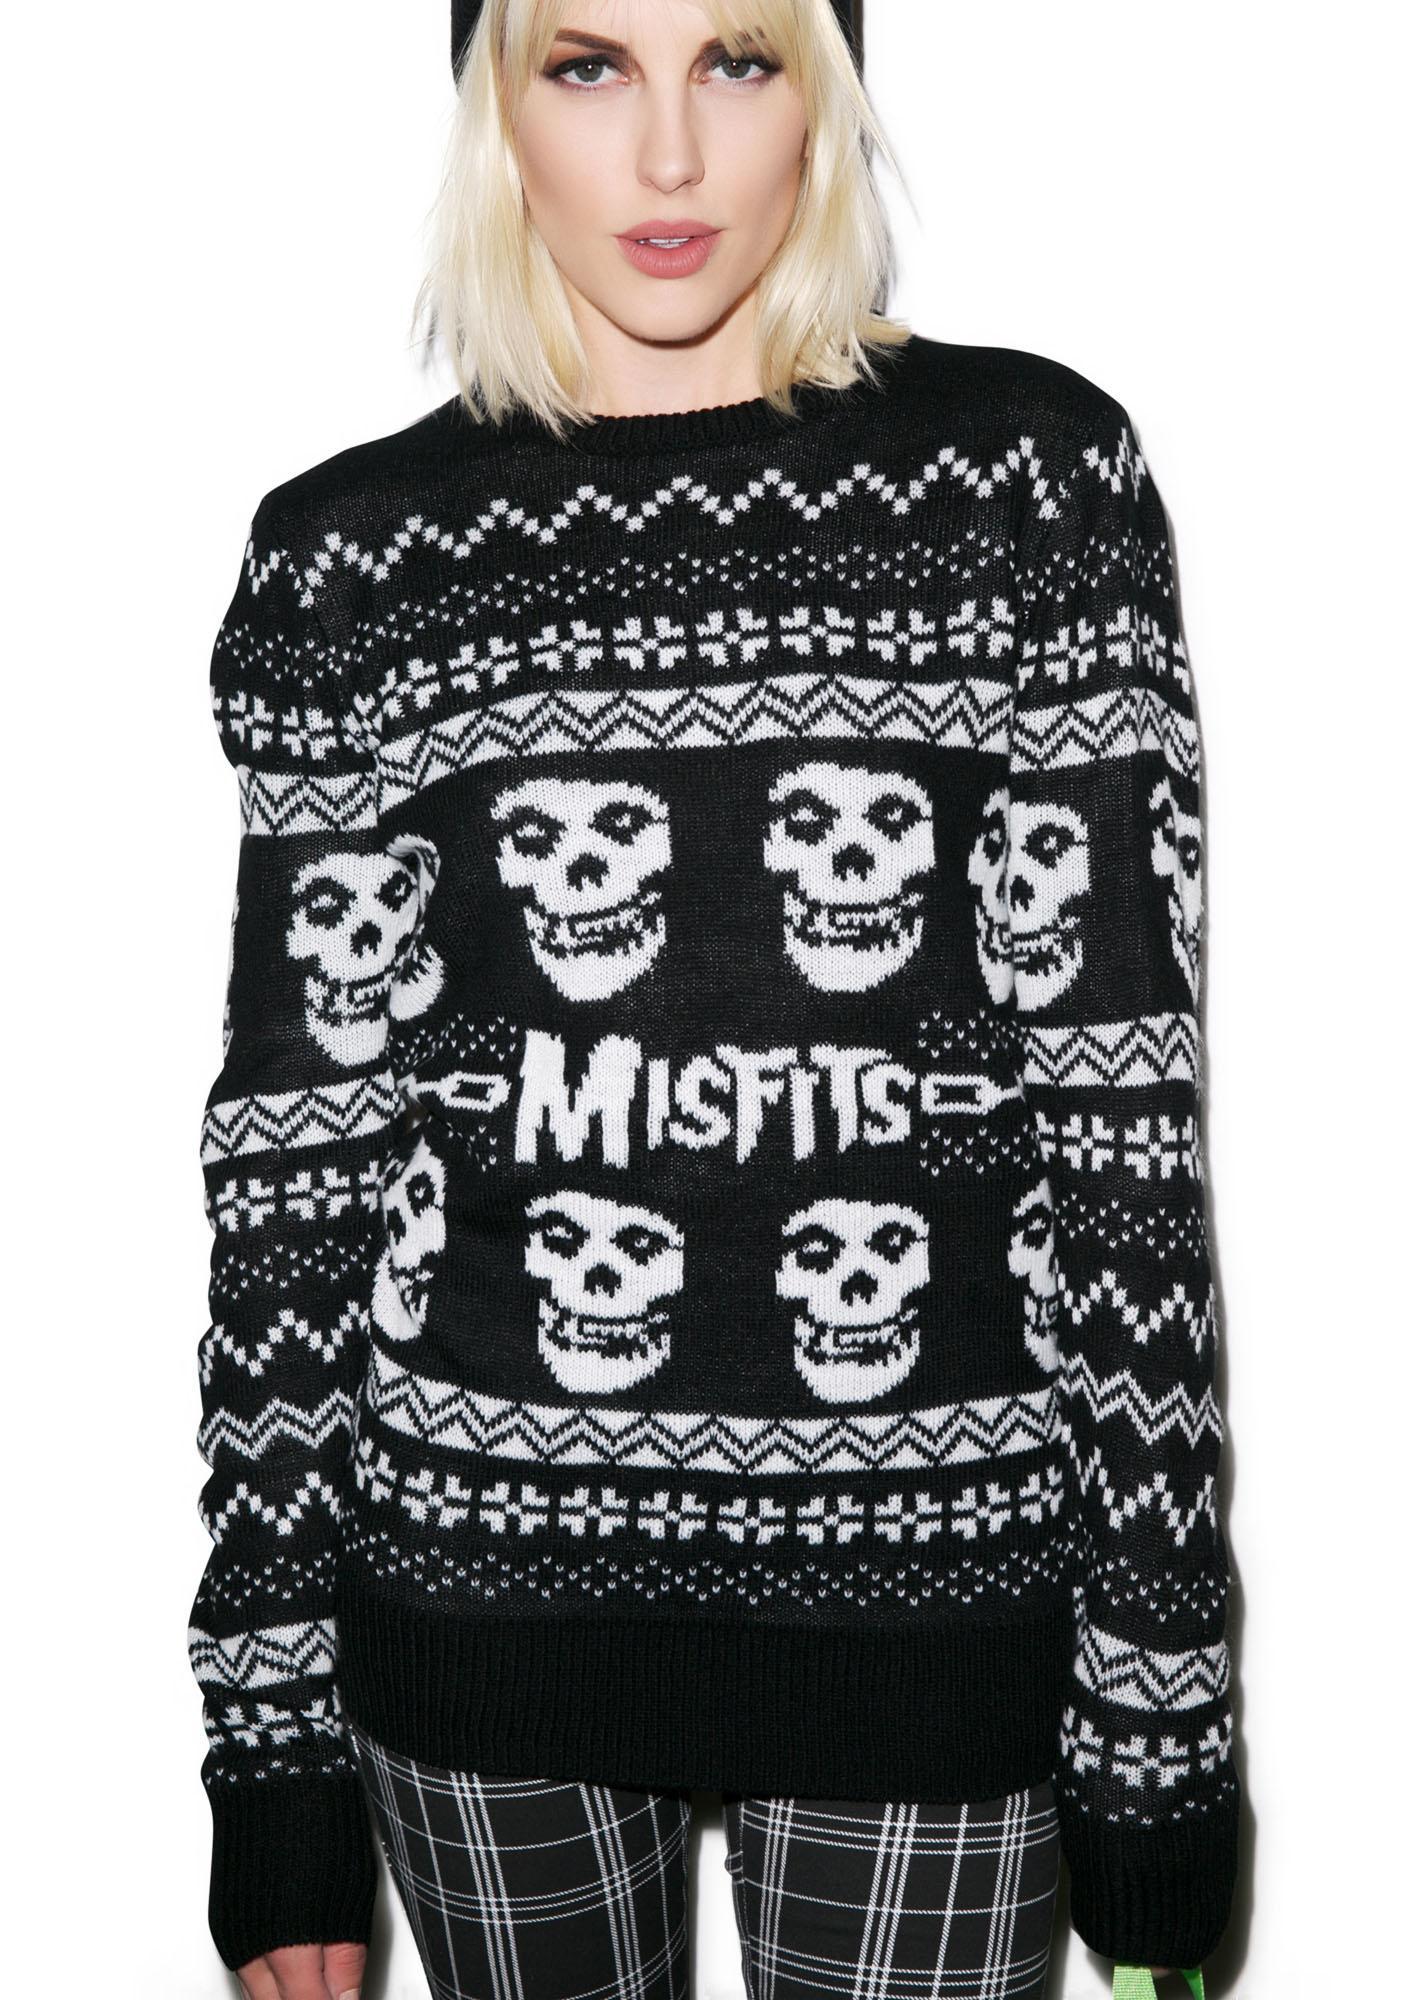 iron fist merry misfits sweater - Misfits Christmas Sweater